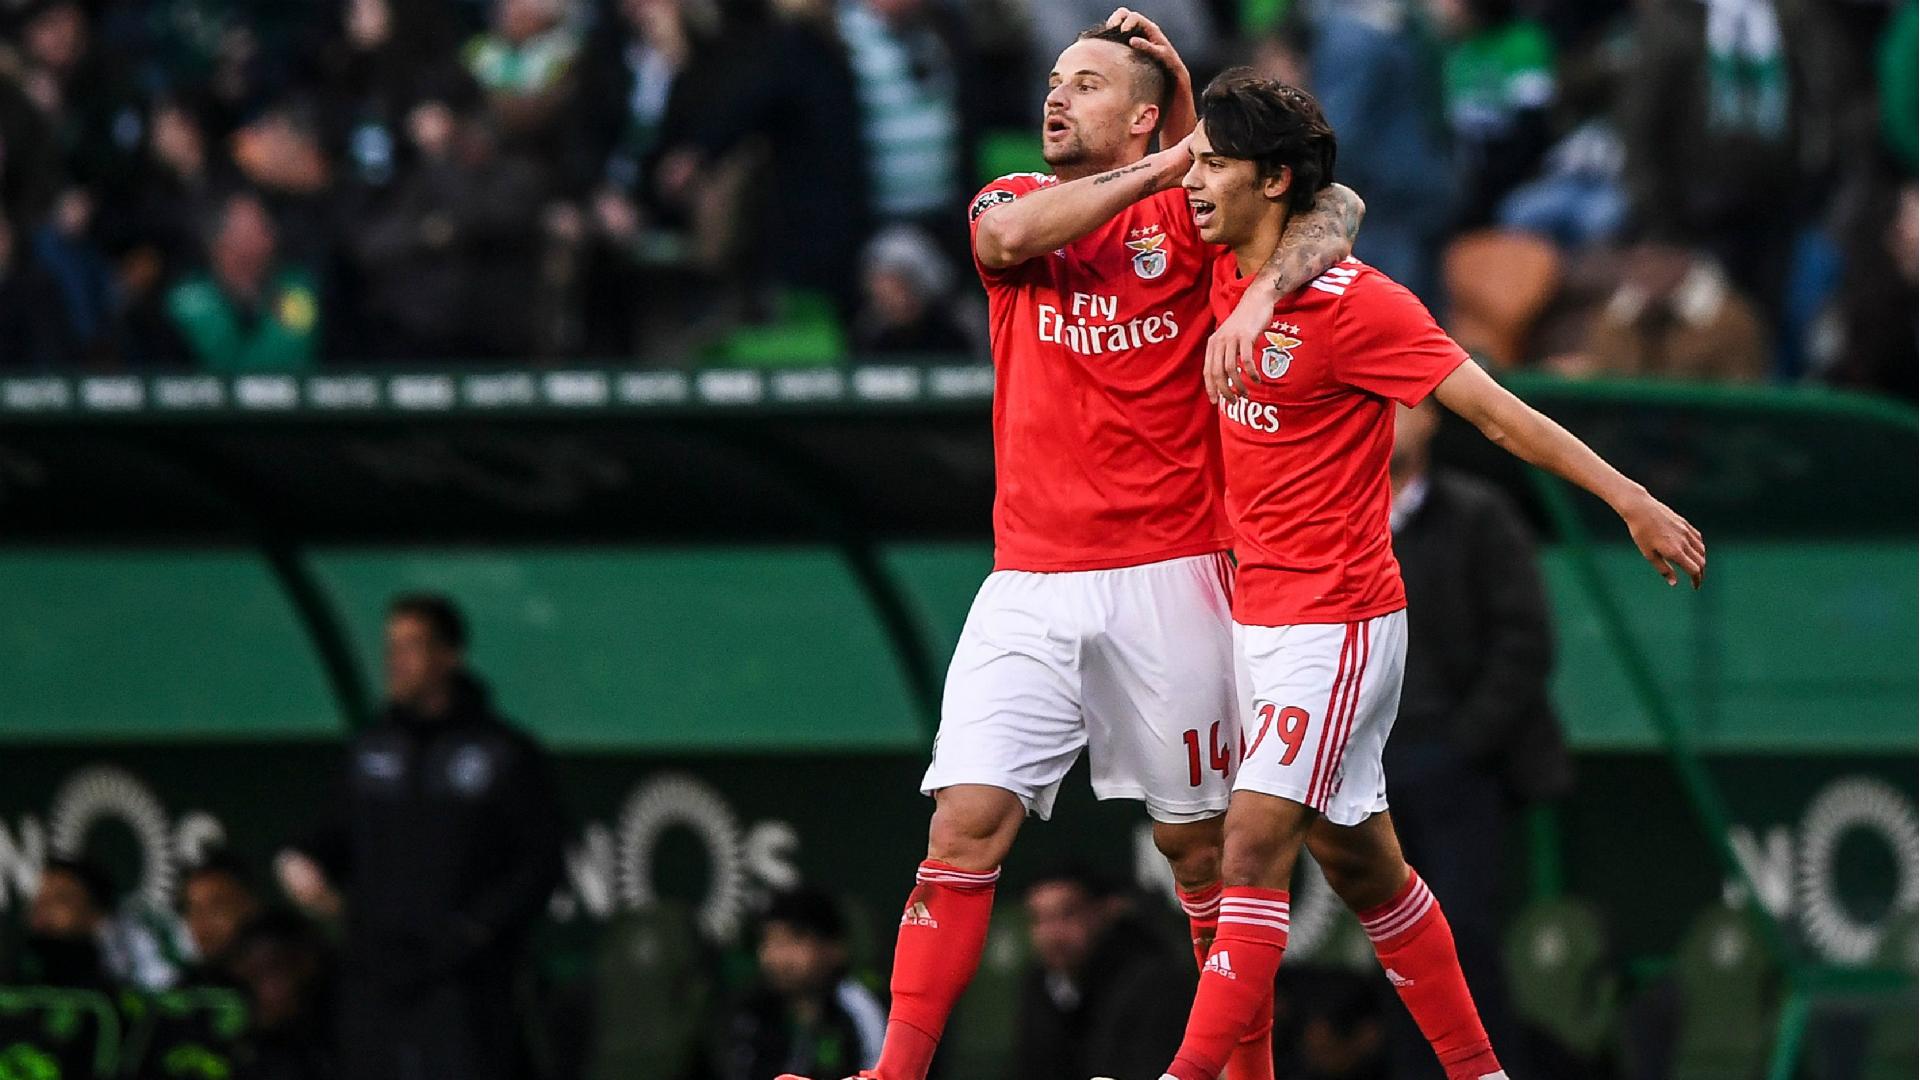 João Felix Haris Seferovic Benfica